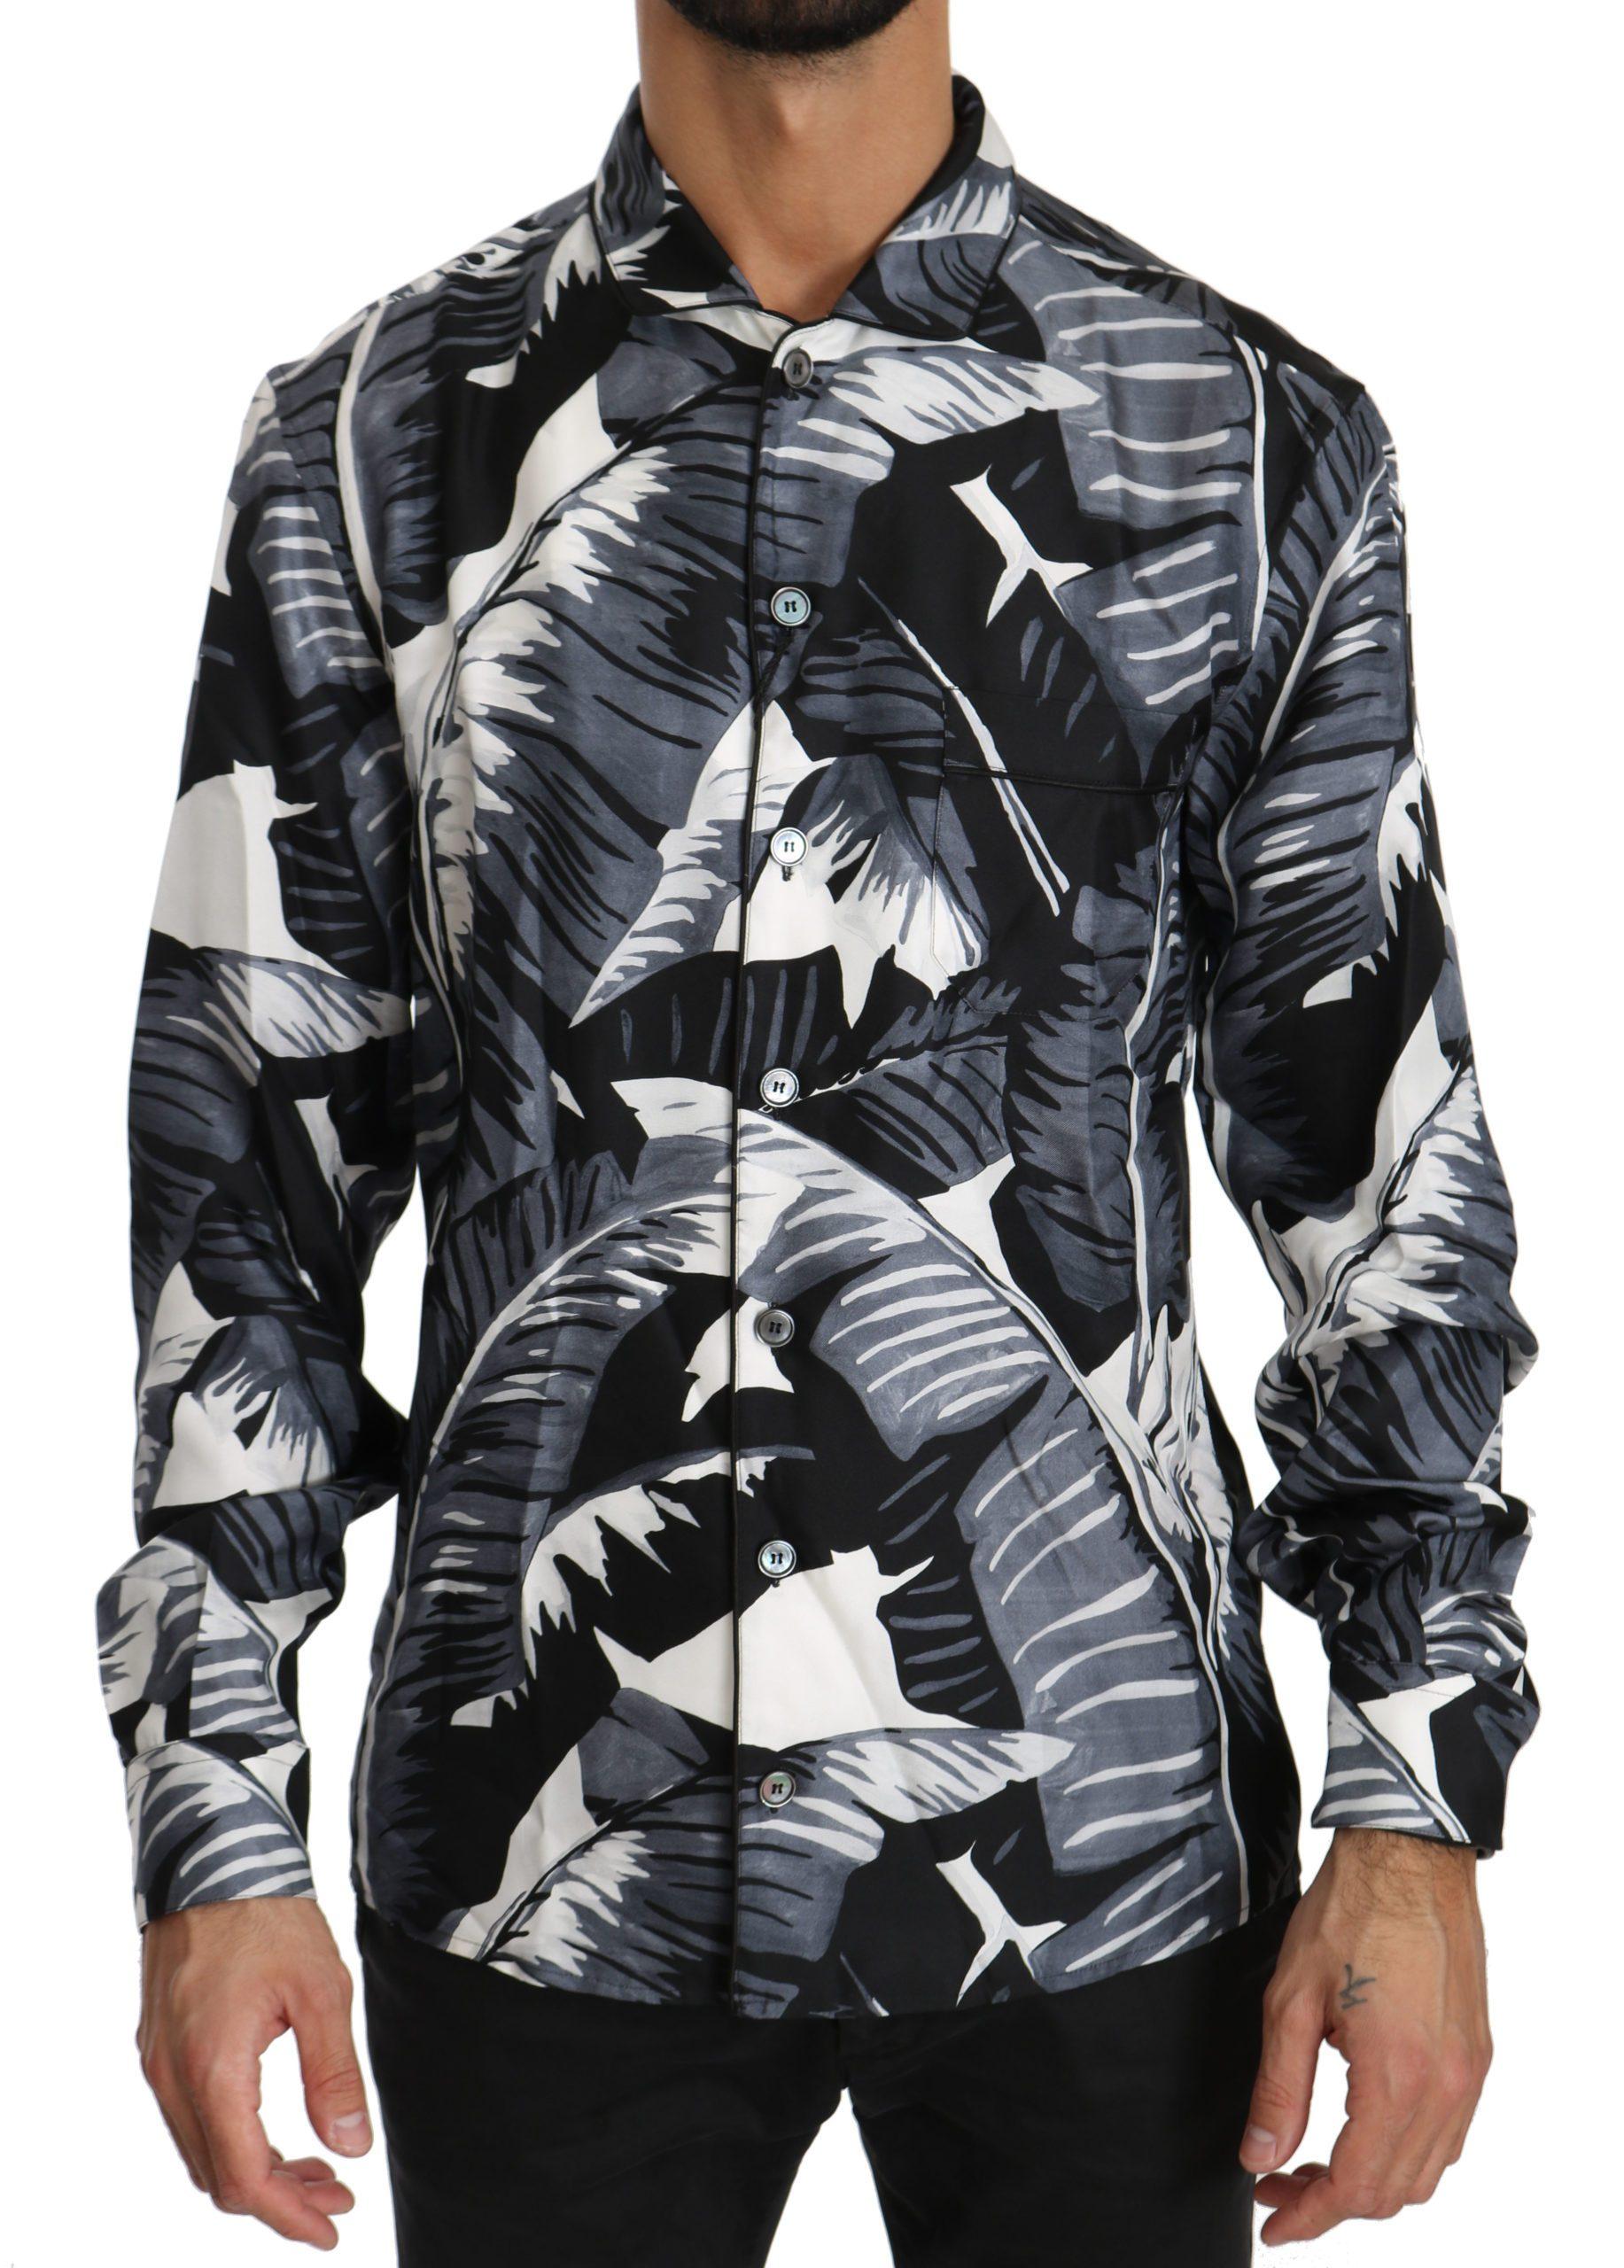 Dolce & Gabbana Men's Banana Leaves Silk Shirt Black TSH4010 - IT38 | XS